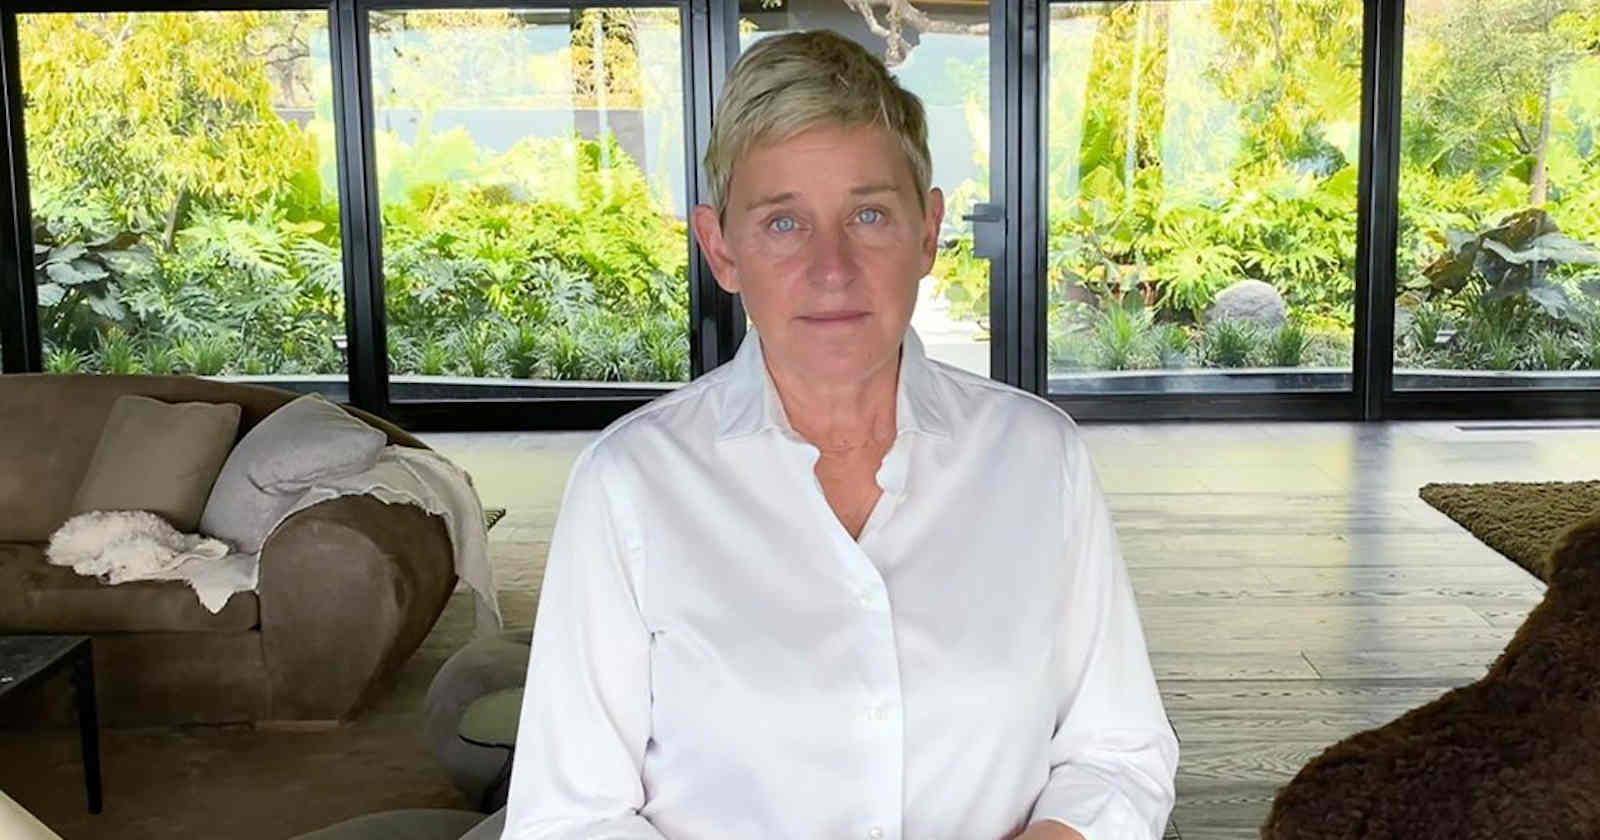 Ellen DeGeneres Tweet About Making Employee 'Cry Like A Baby' Resurfaces